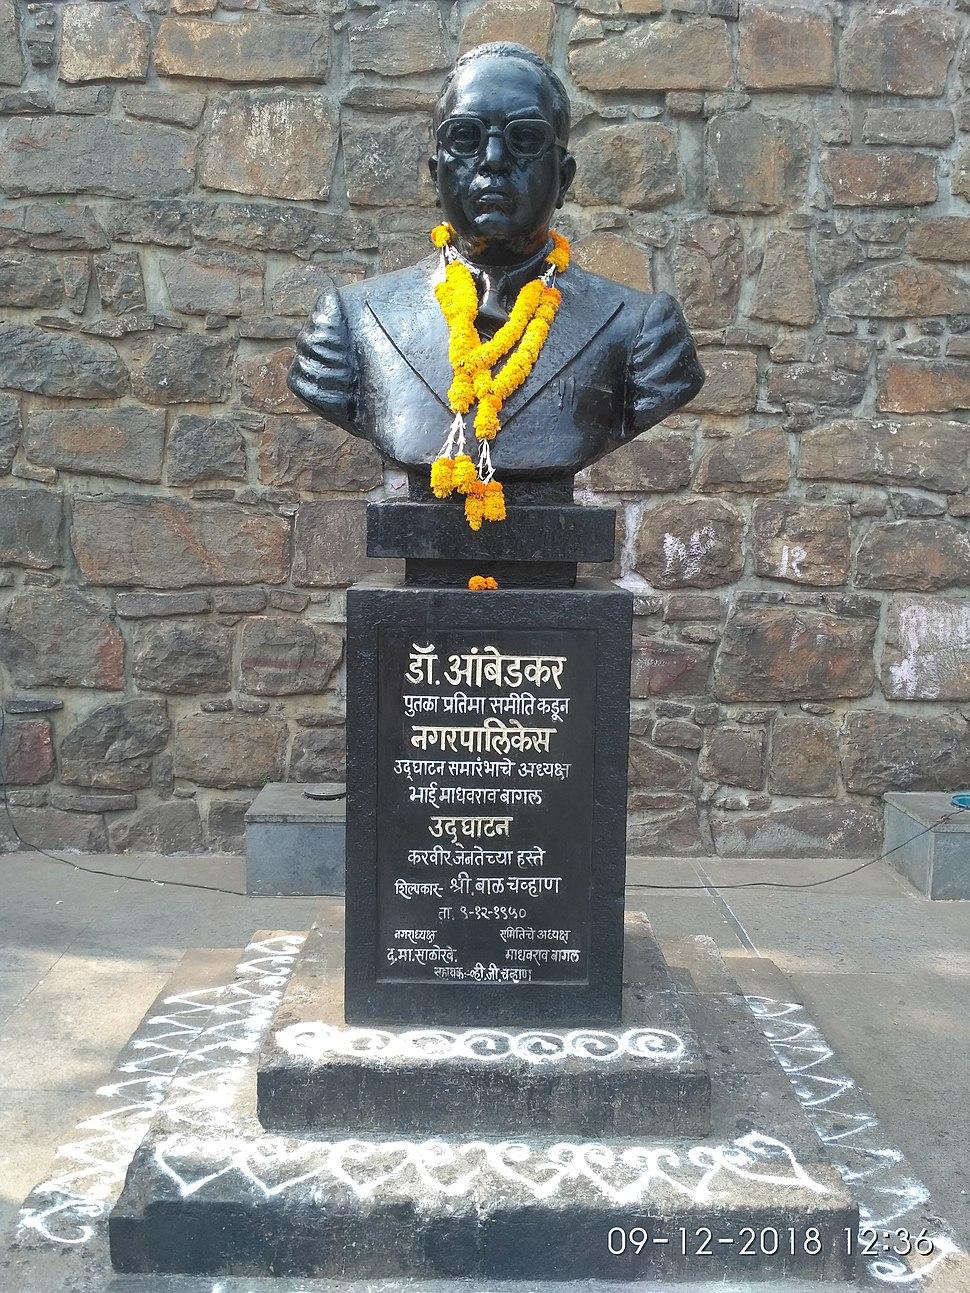 Bust of Dr. Babasaheb Ambedkar at Bindu Chowk in Kolhapur